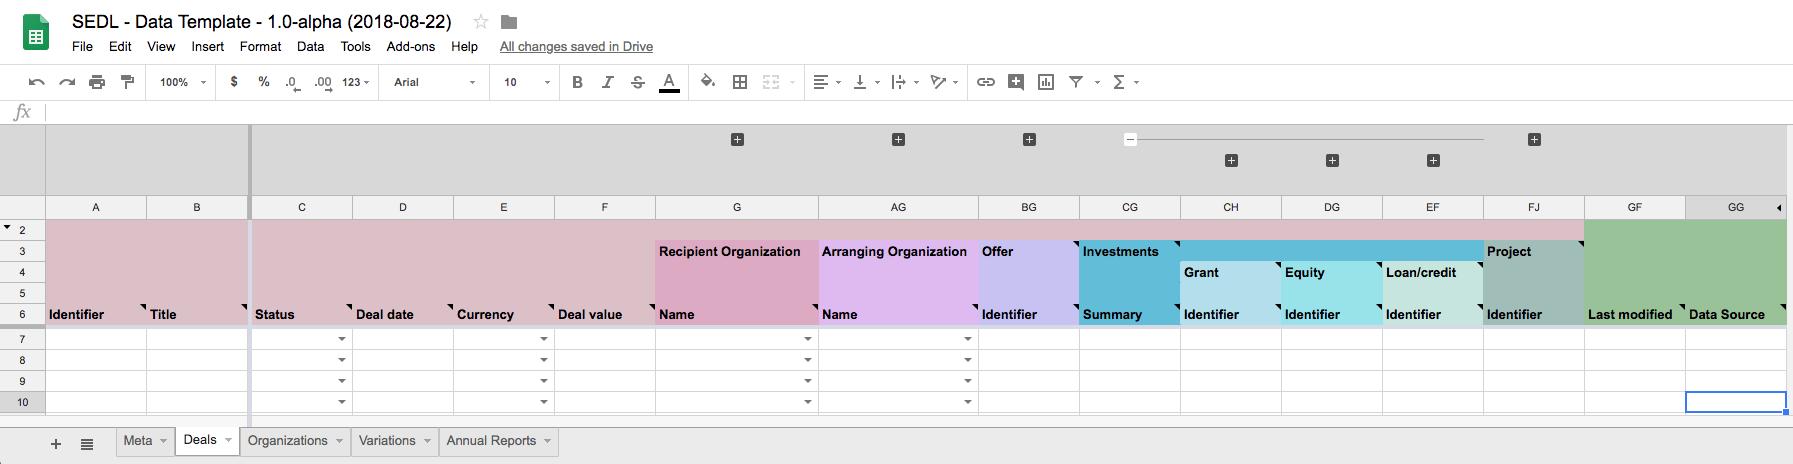 Data Templates Social Economy Data Lab Specification Alpha 00